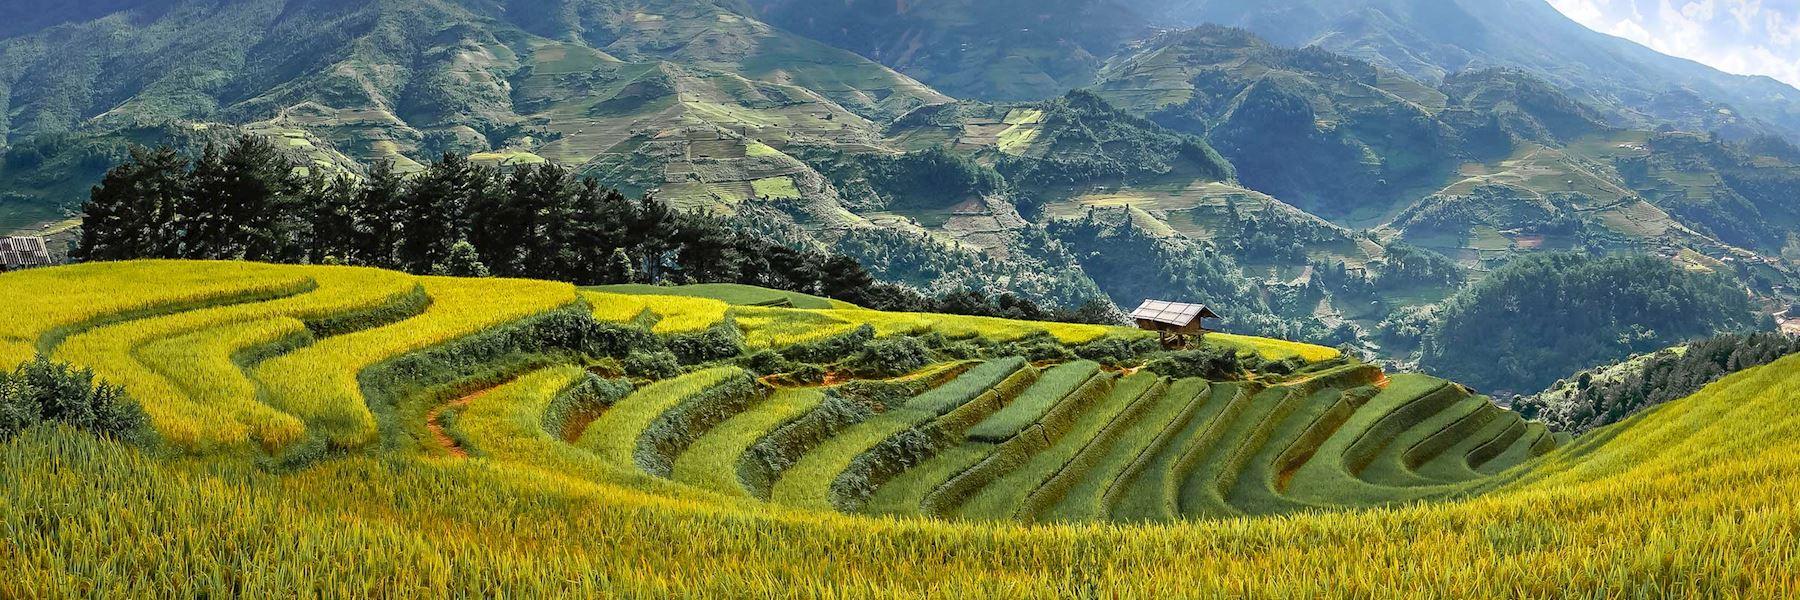 Visit Mu Cang Chai, Vietnam